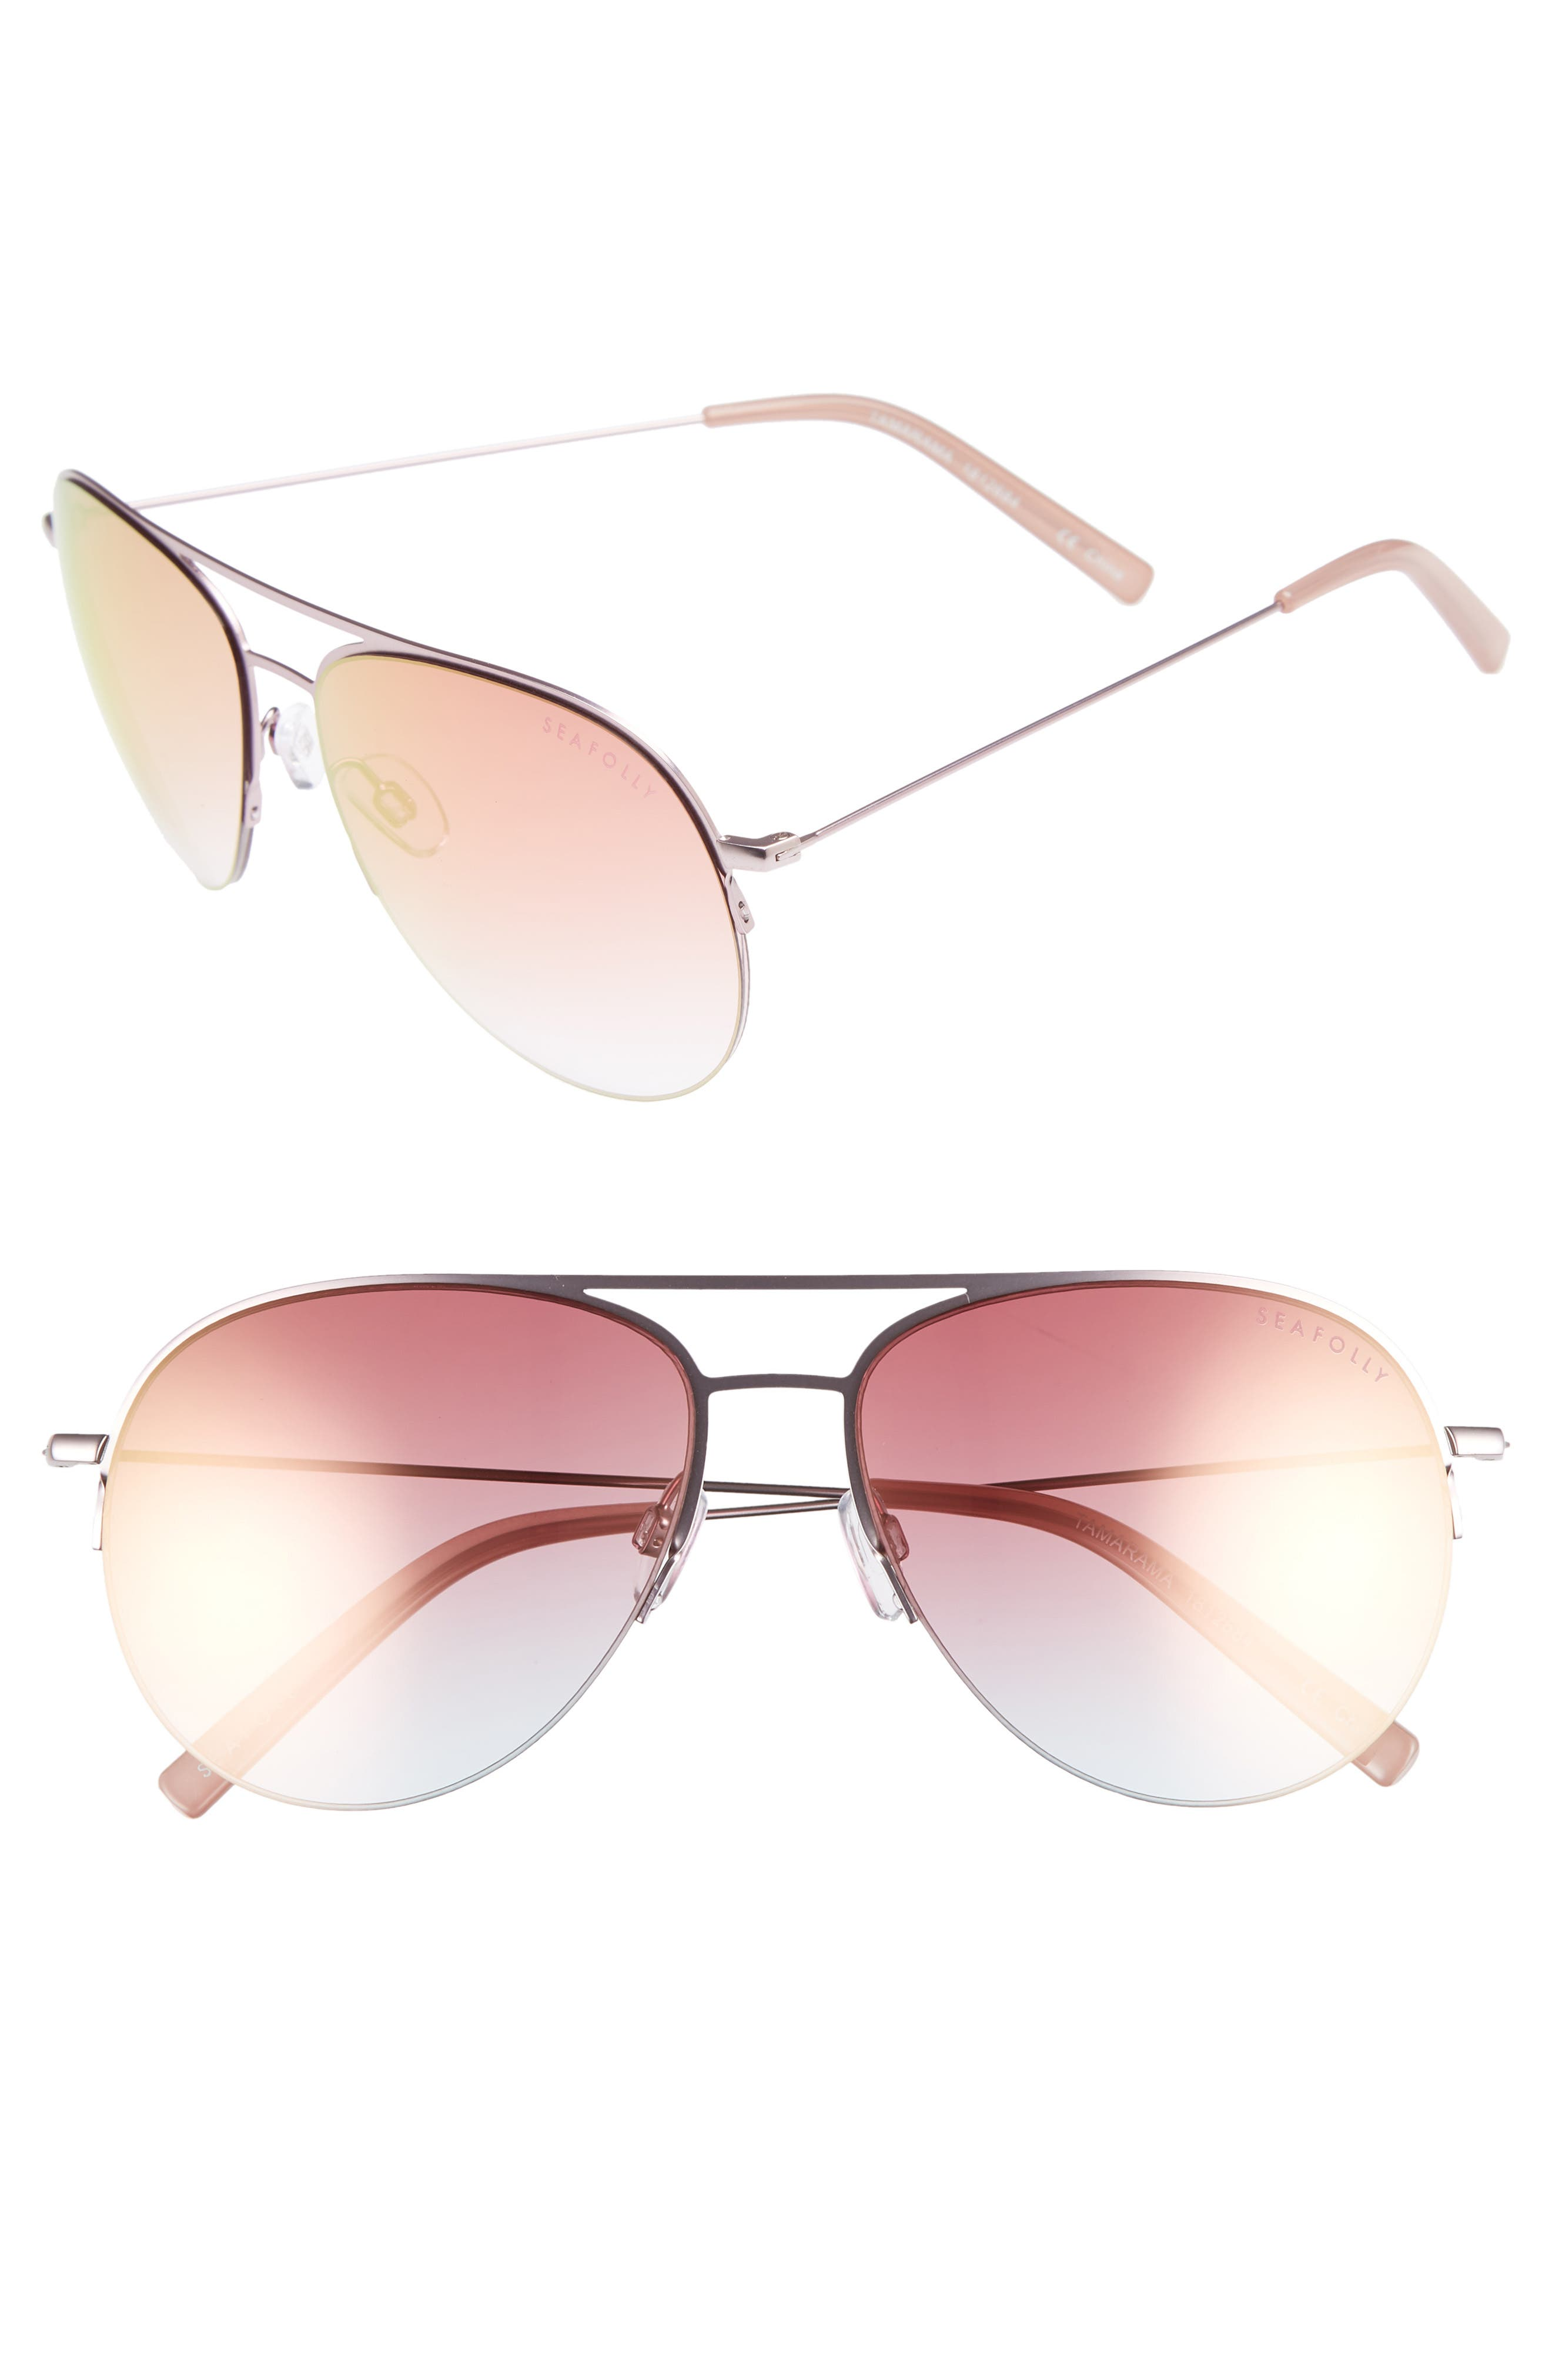 Tamarama 60mm Aviator Sunglasses,                             Main thumbnail 1, color,                             612